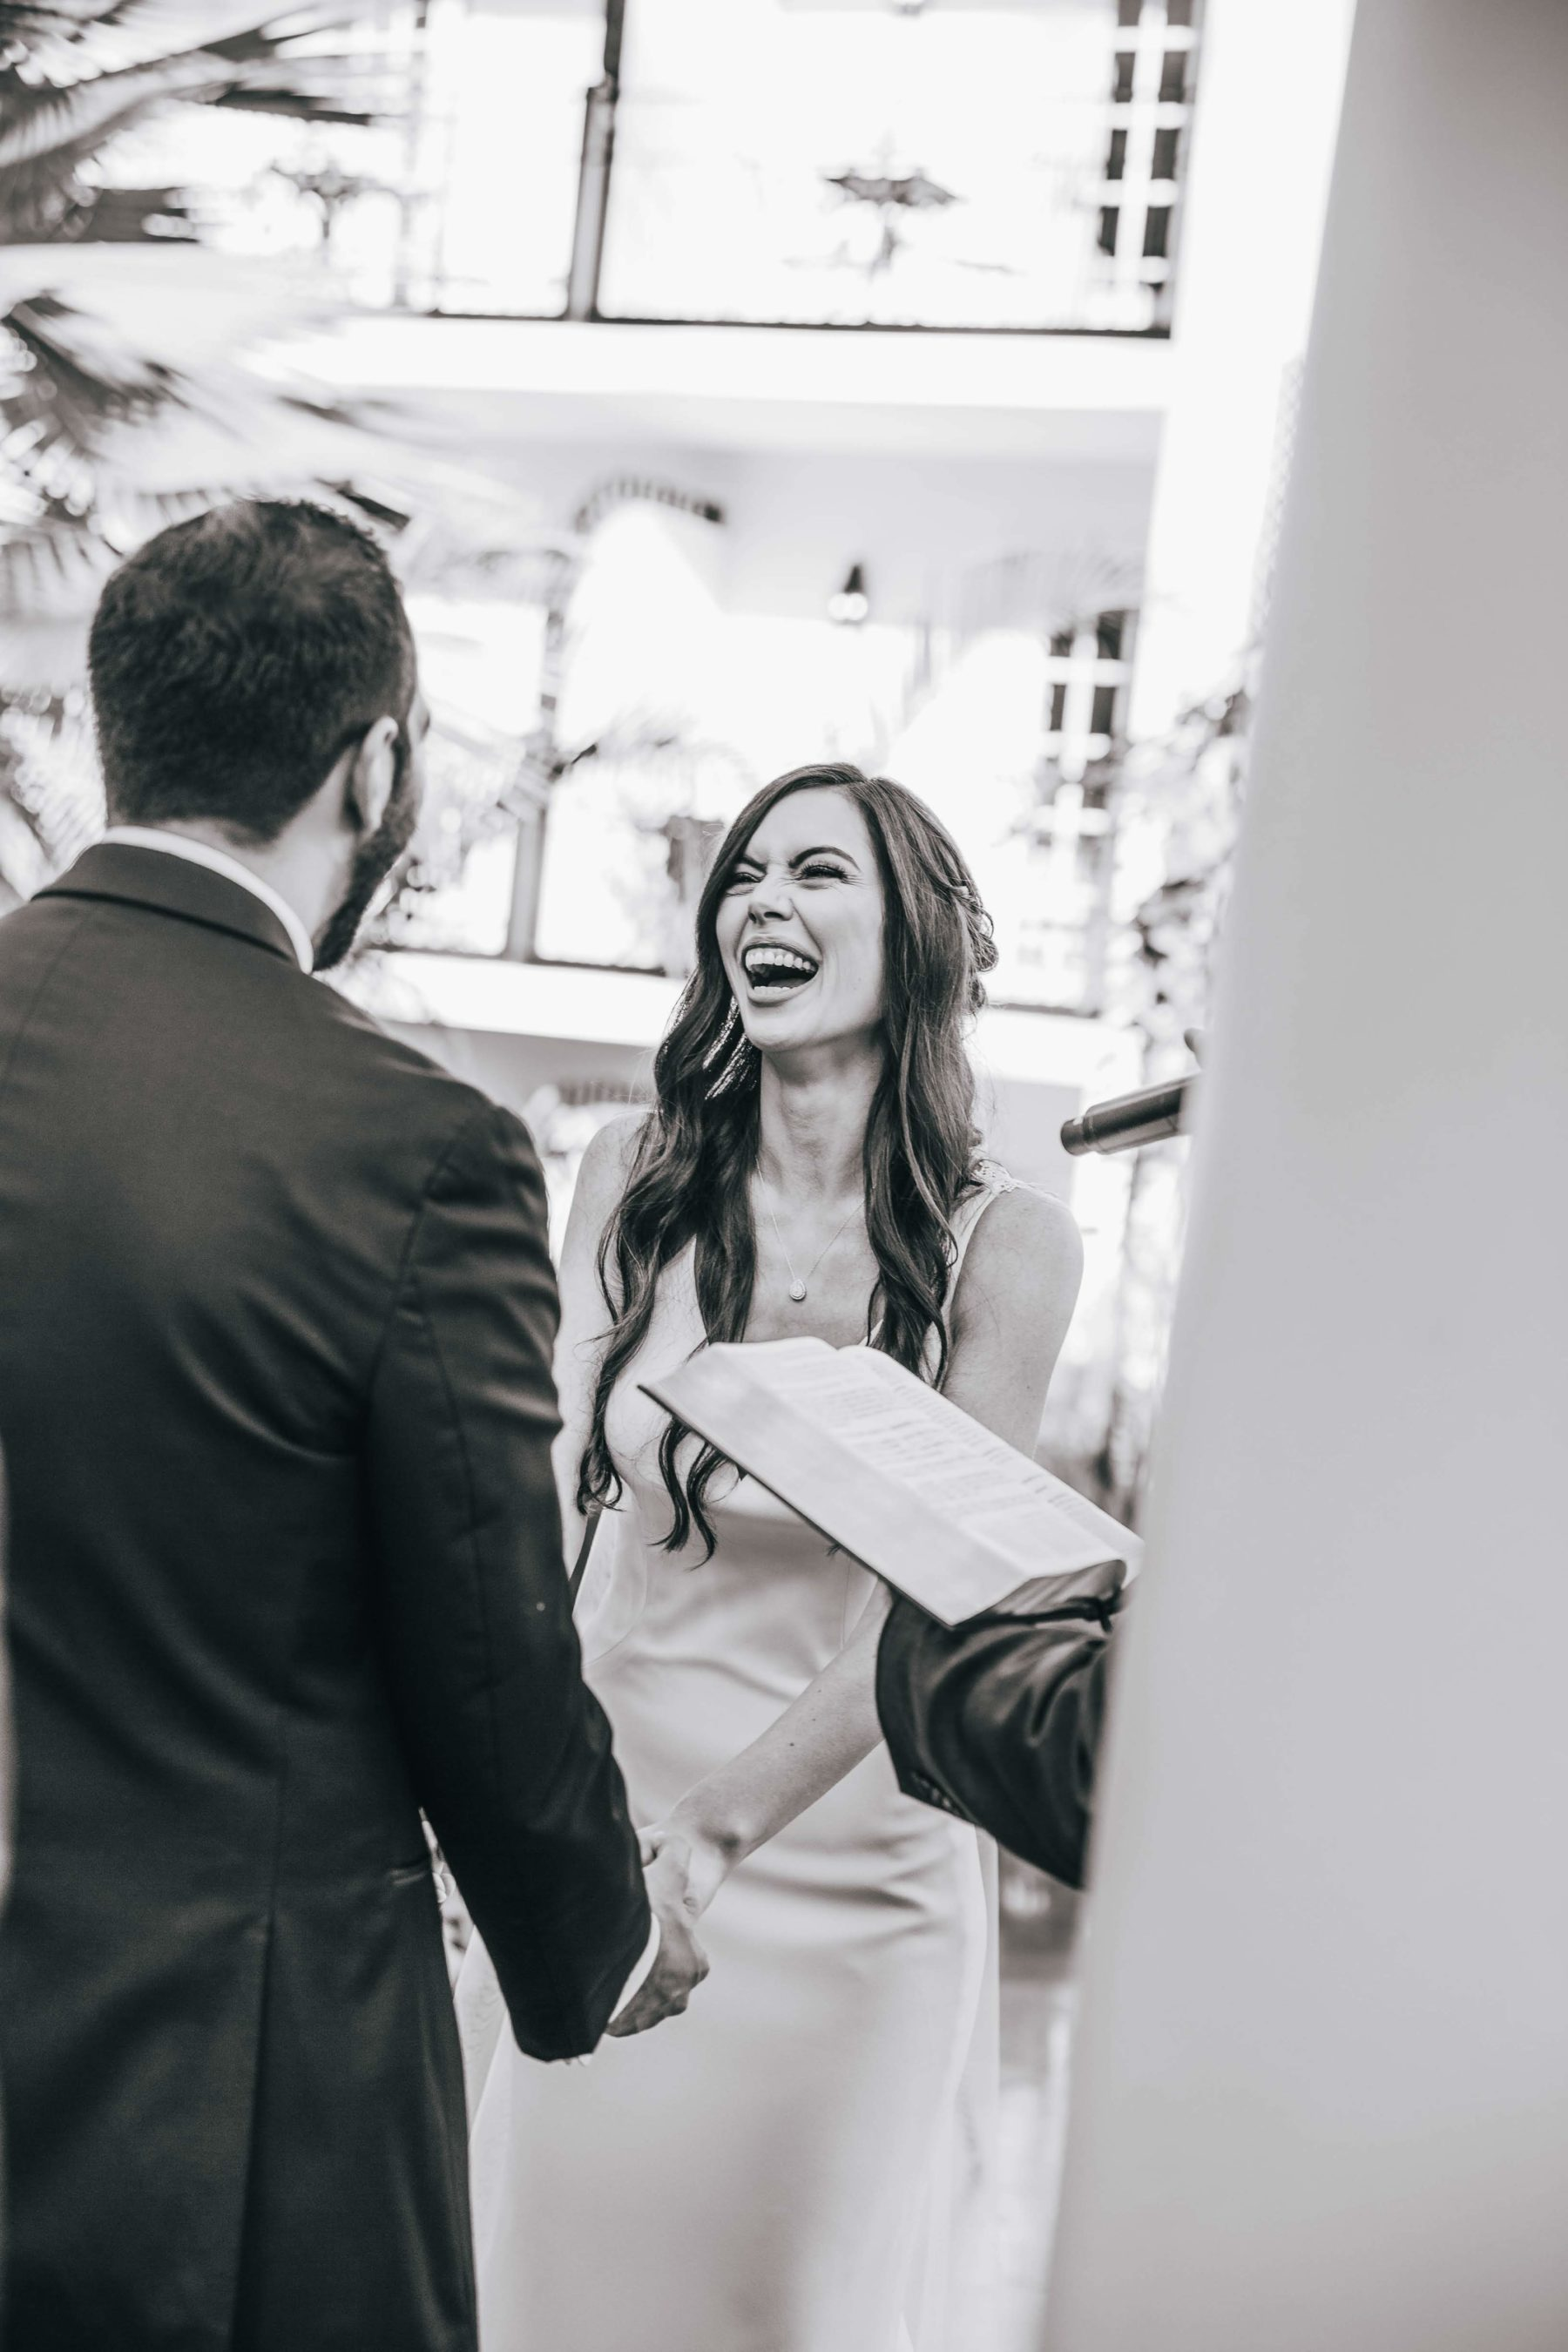 Wedding Photographer Grace Upon Grace featured on Nashville Bride Guide